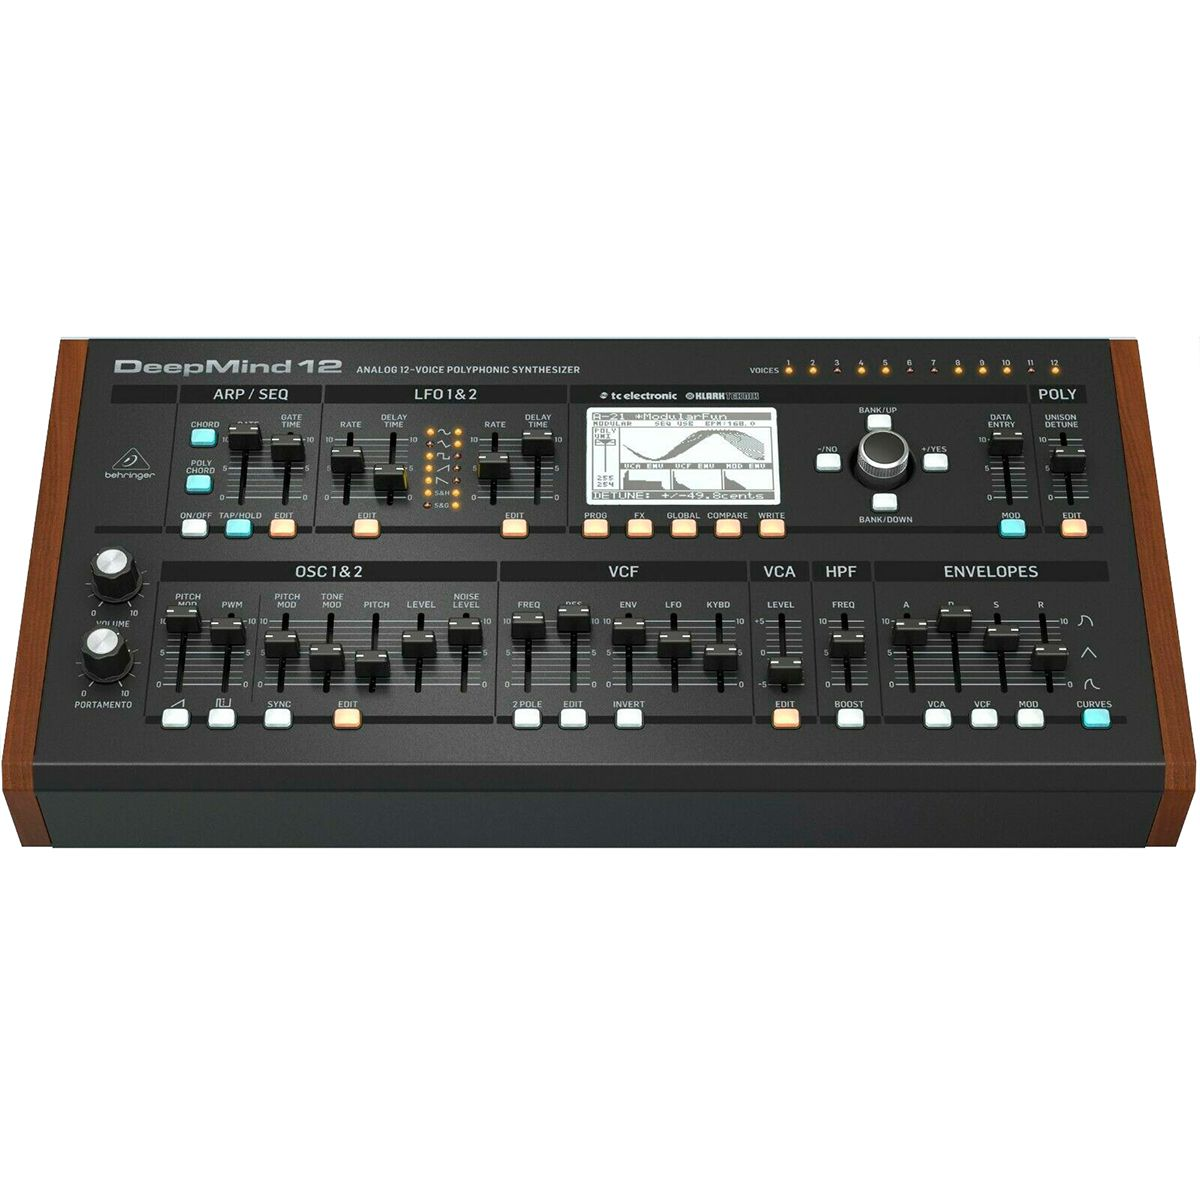 Sintetizador Analógico Behringer Deepmind12 D com12 Vozes